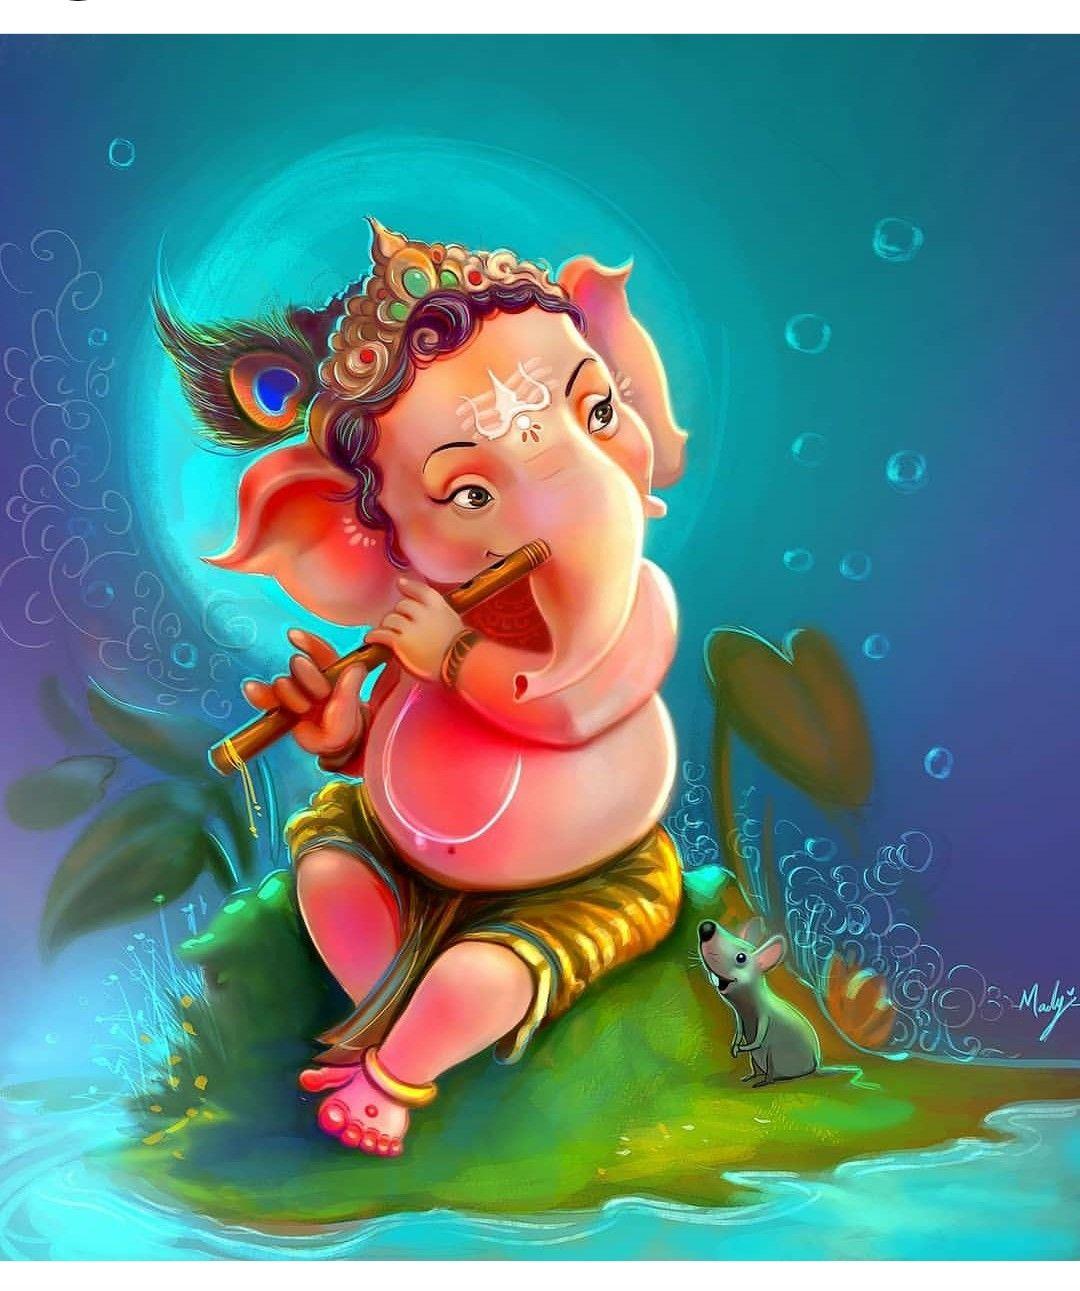 Ganapati Ganesh Chaturthi Images Lord Ganesha Paintings Happy Ganesh Chaturthi